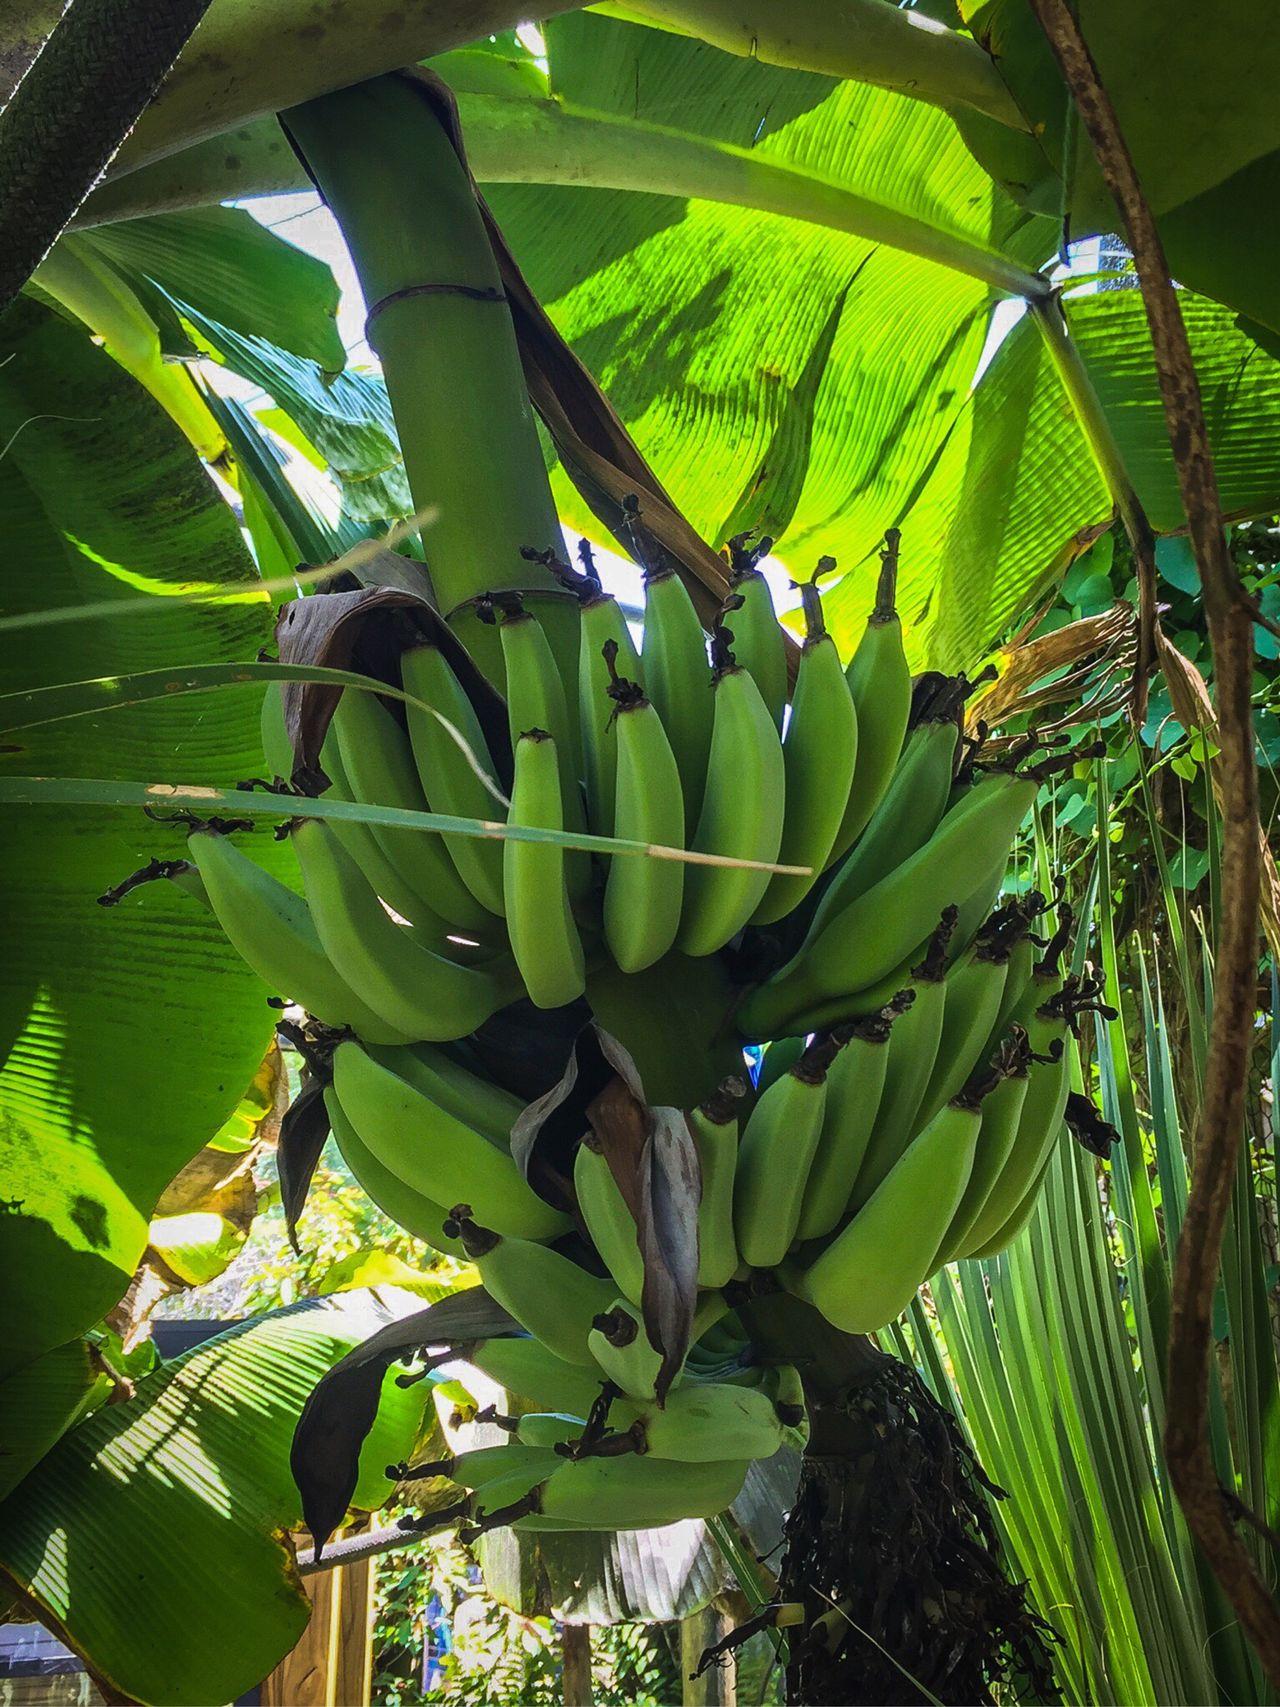 Bananas, Tree Fruit Nature Fresh Unripe Portrait Bunch Of Bananas Green Bananas